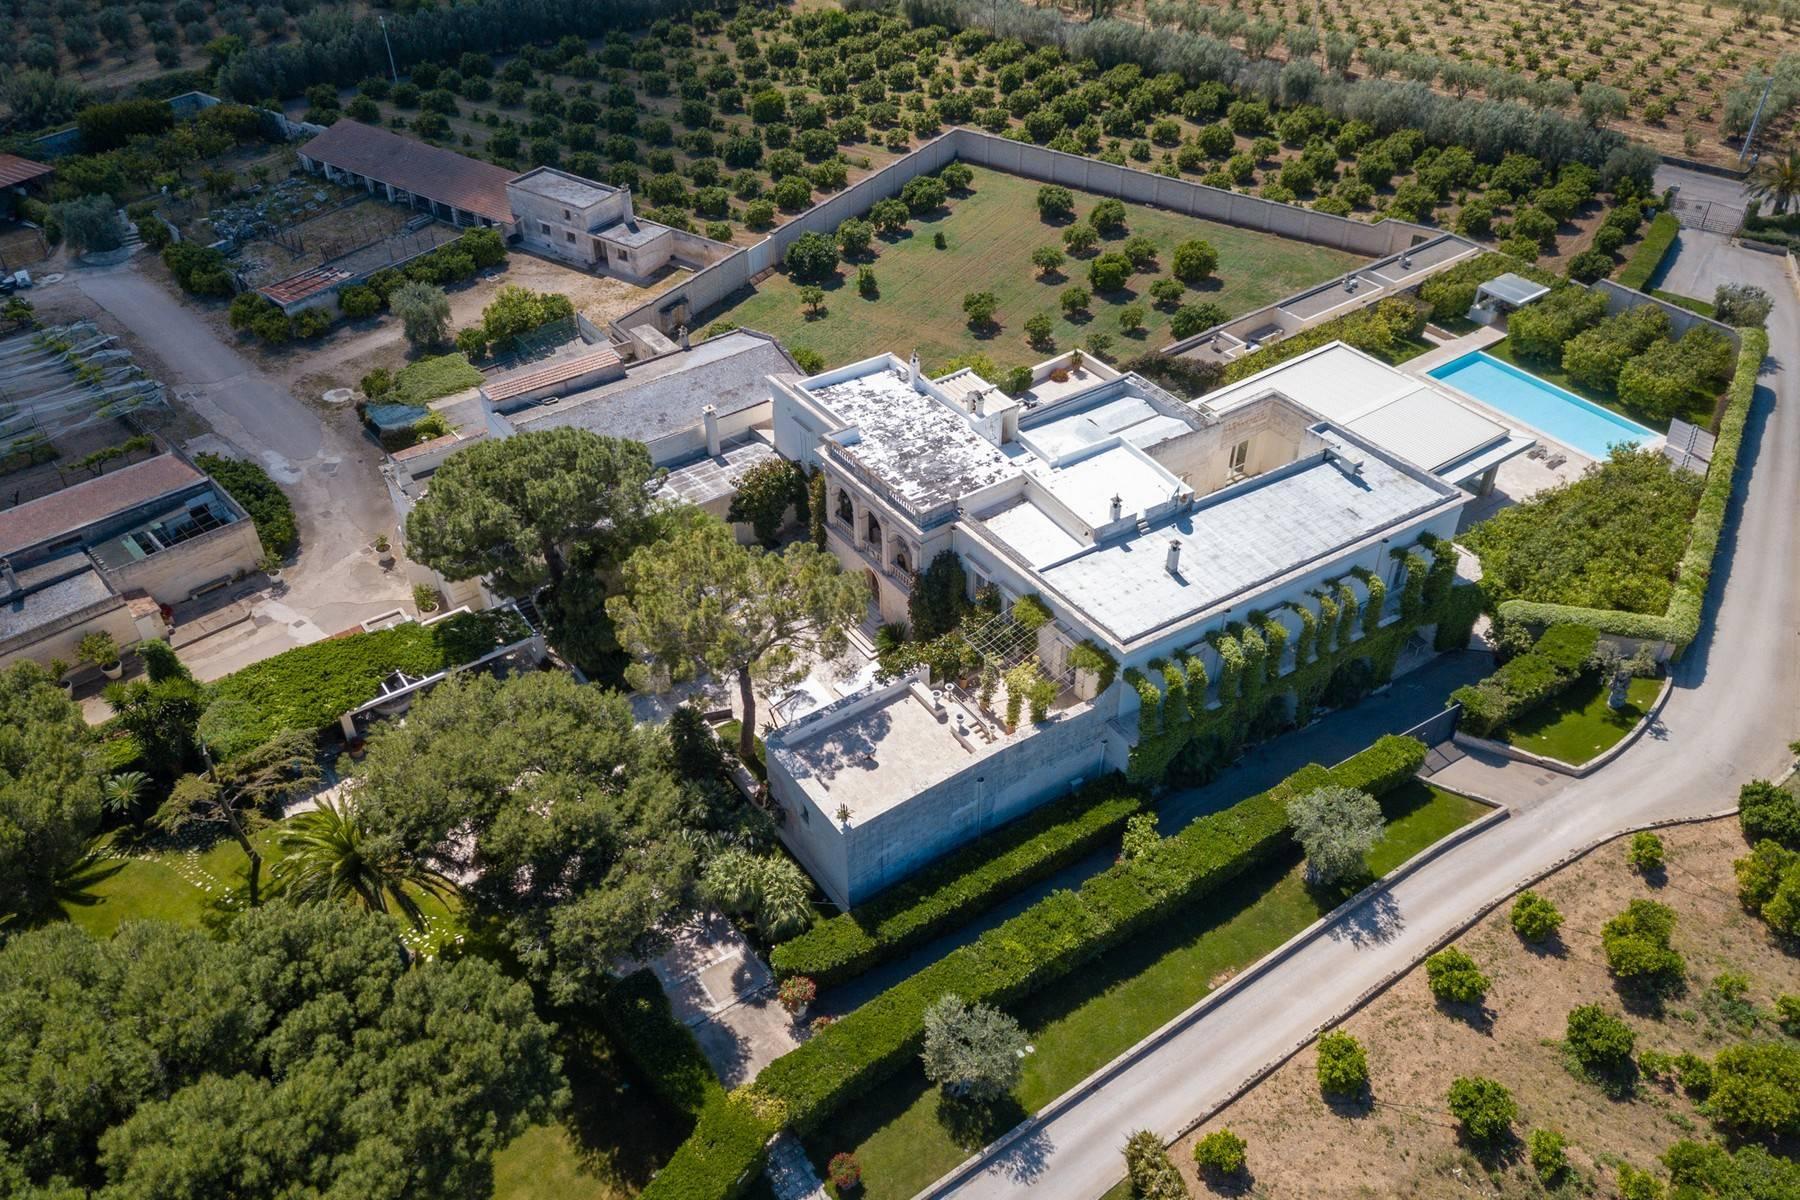 Splendida villa gentilizia del '600 circondata da agrumeti - 16